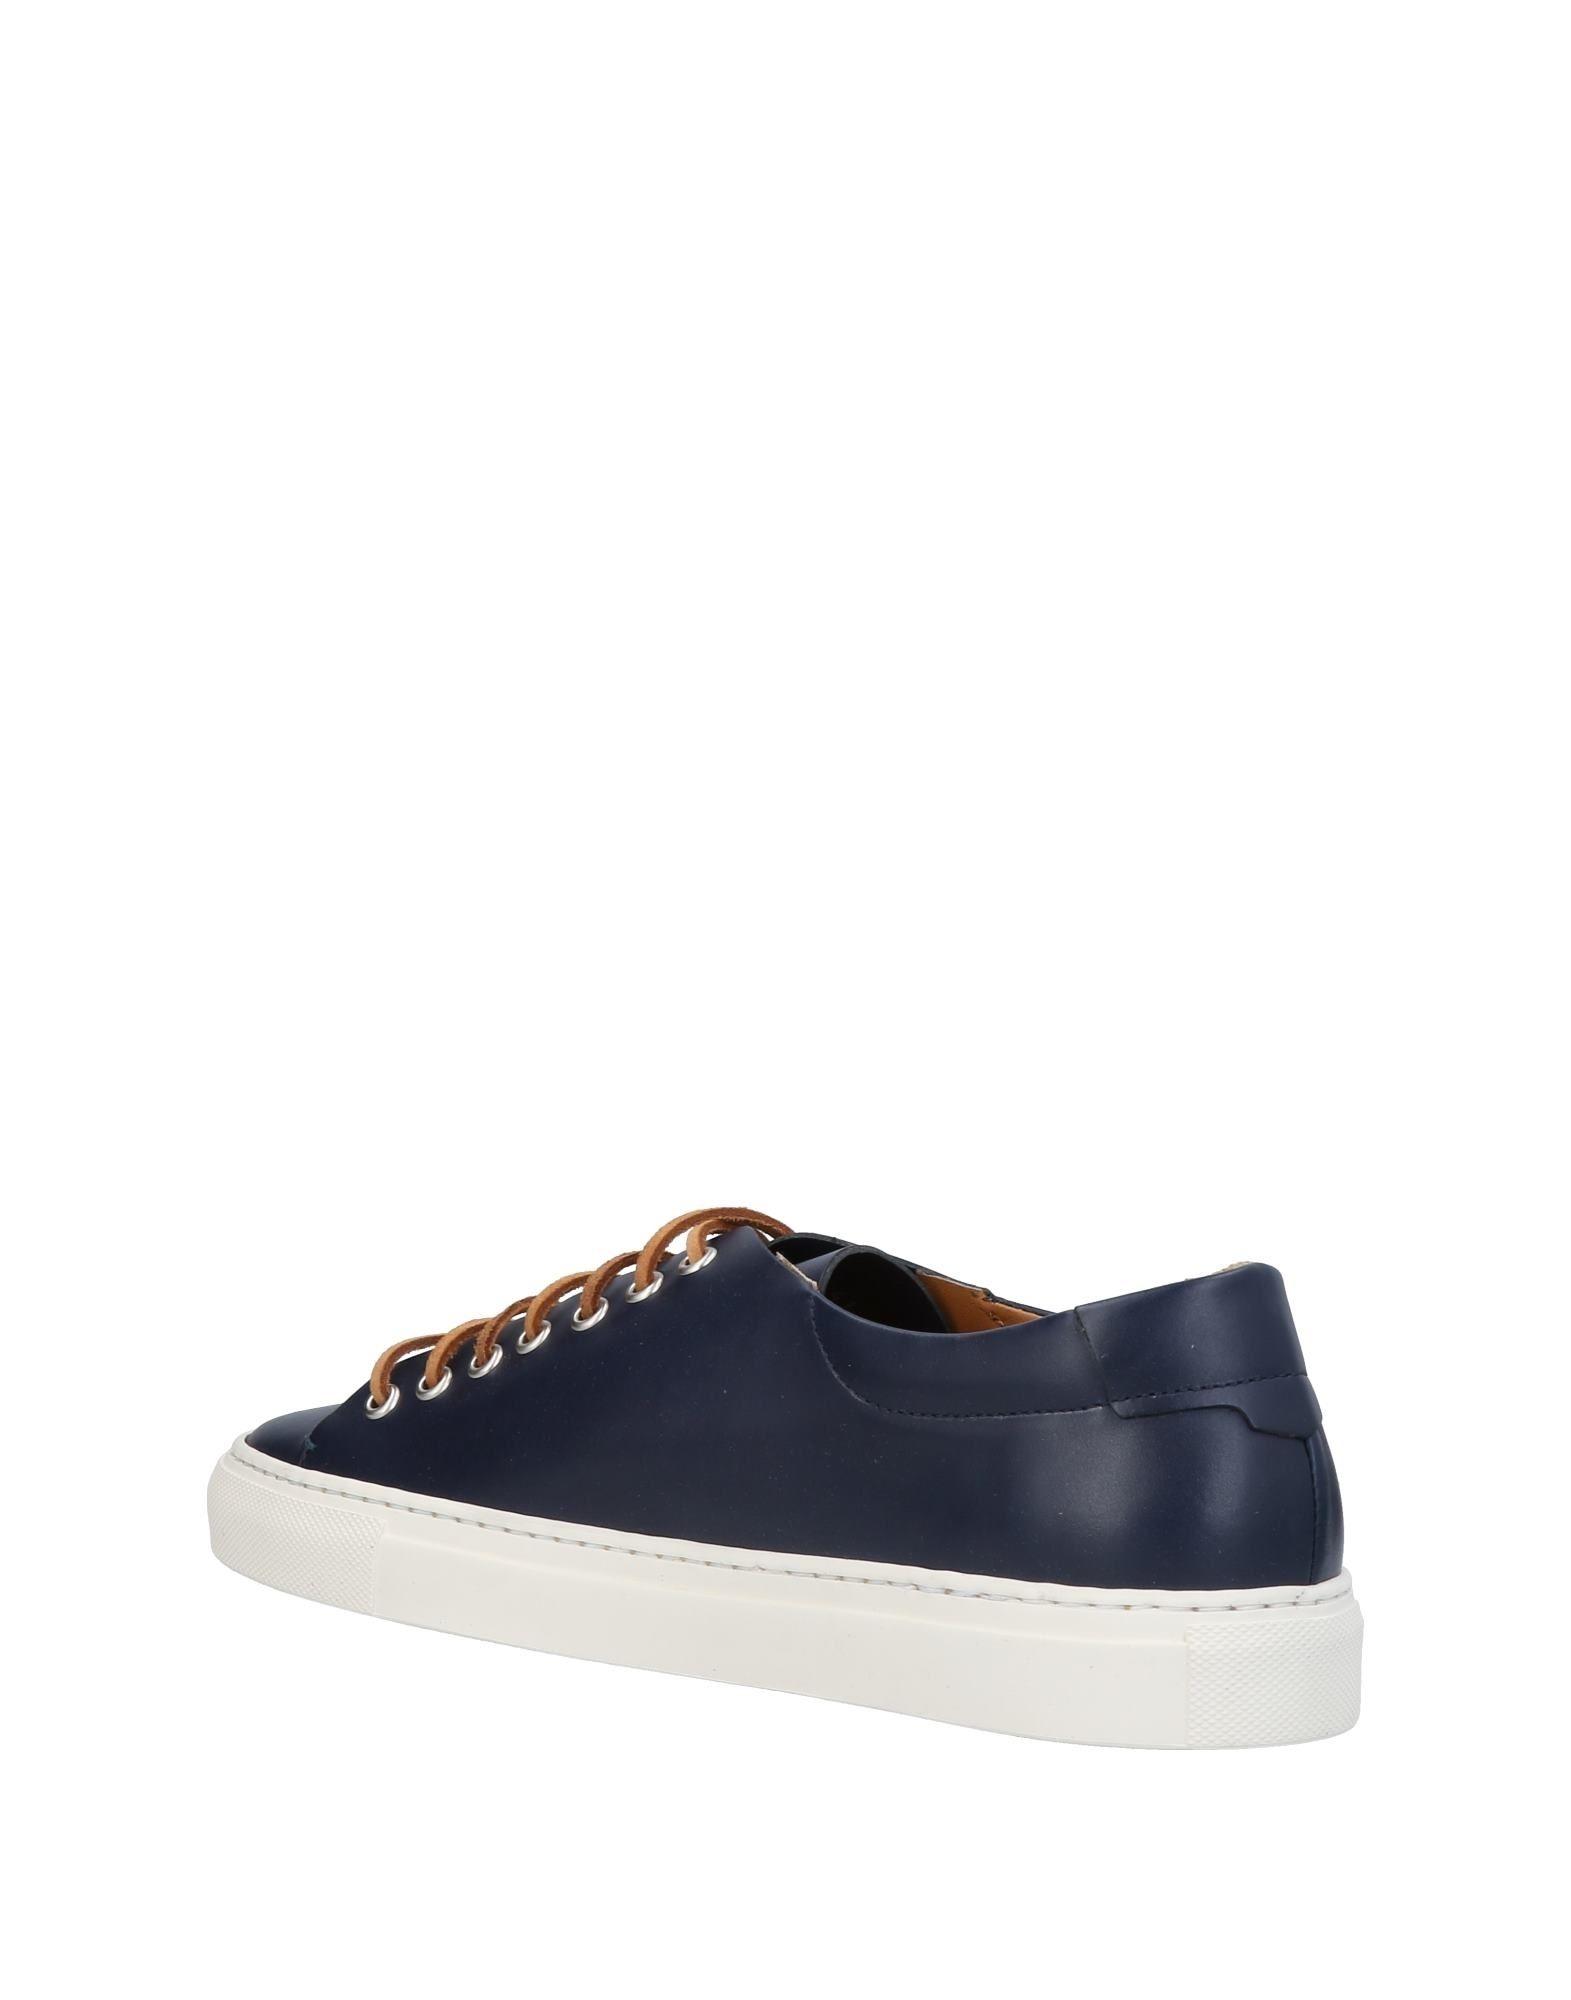 A buon mercato Sneakers Boemos Uomo - 11454791LB